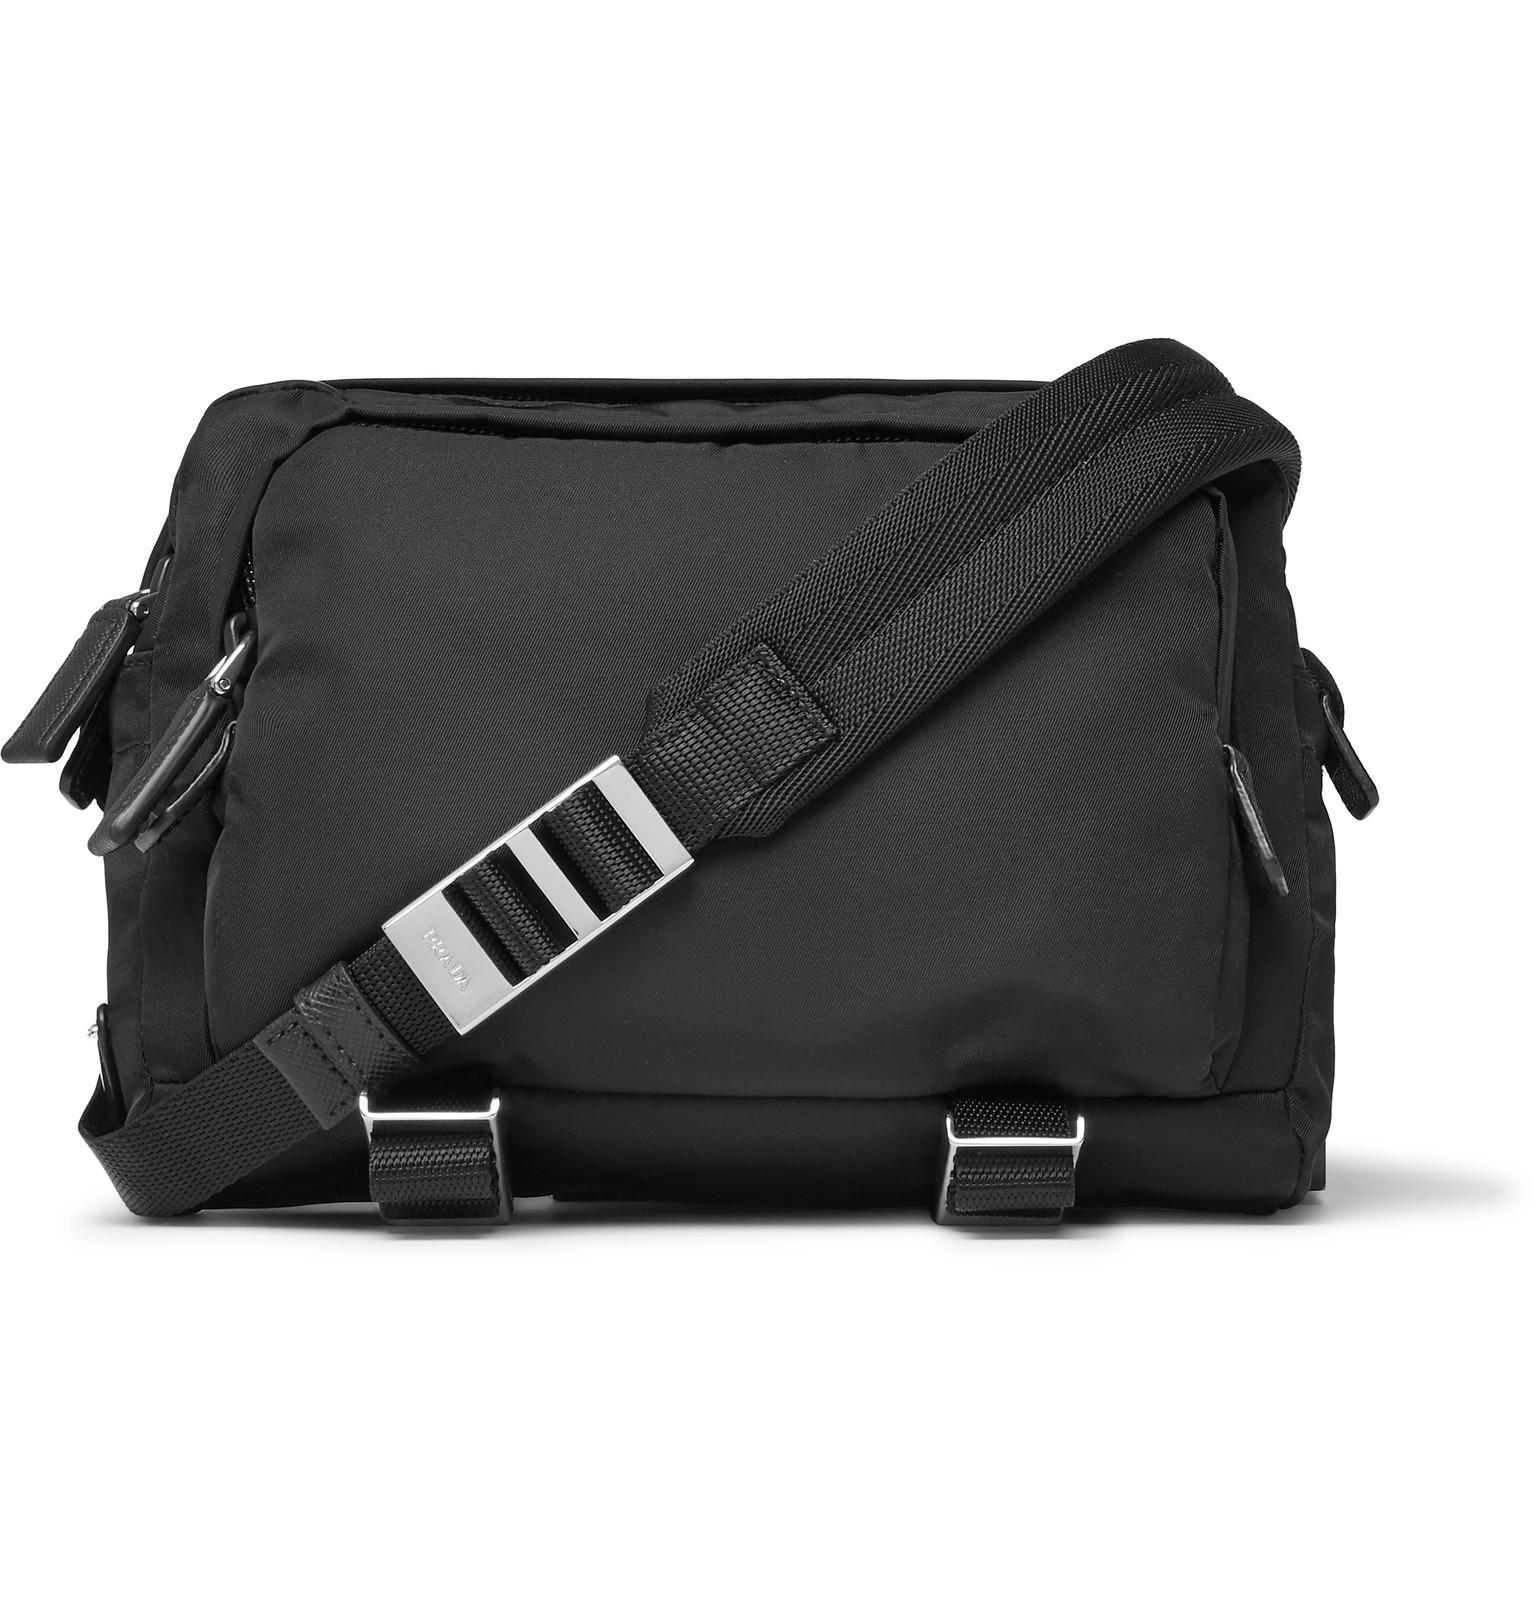 825177f5e71c21 ... norway prada nylon camera bag in black for men lyst a5bab 53104